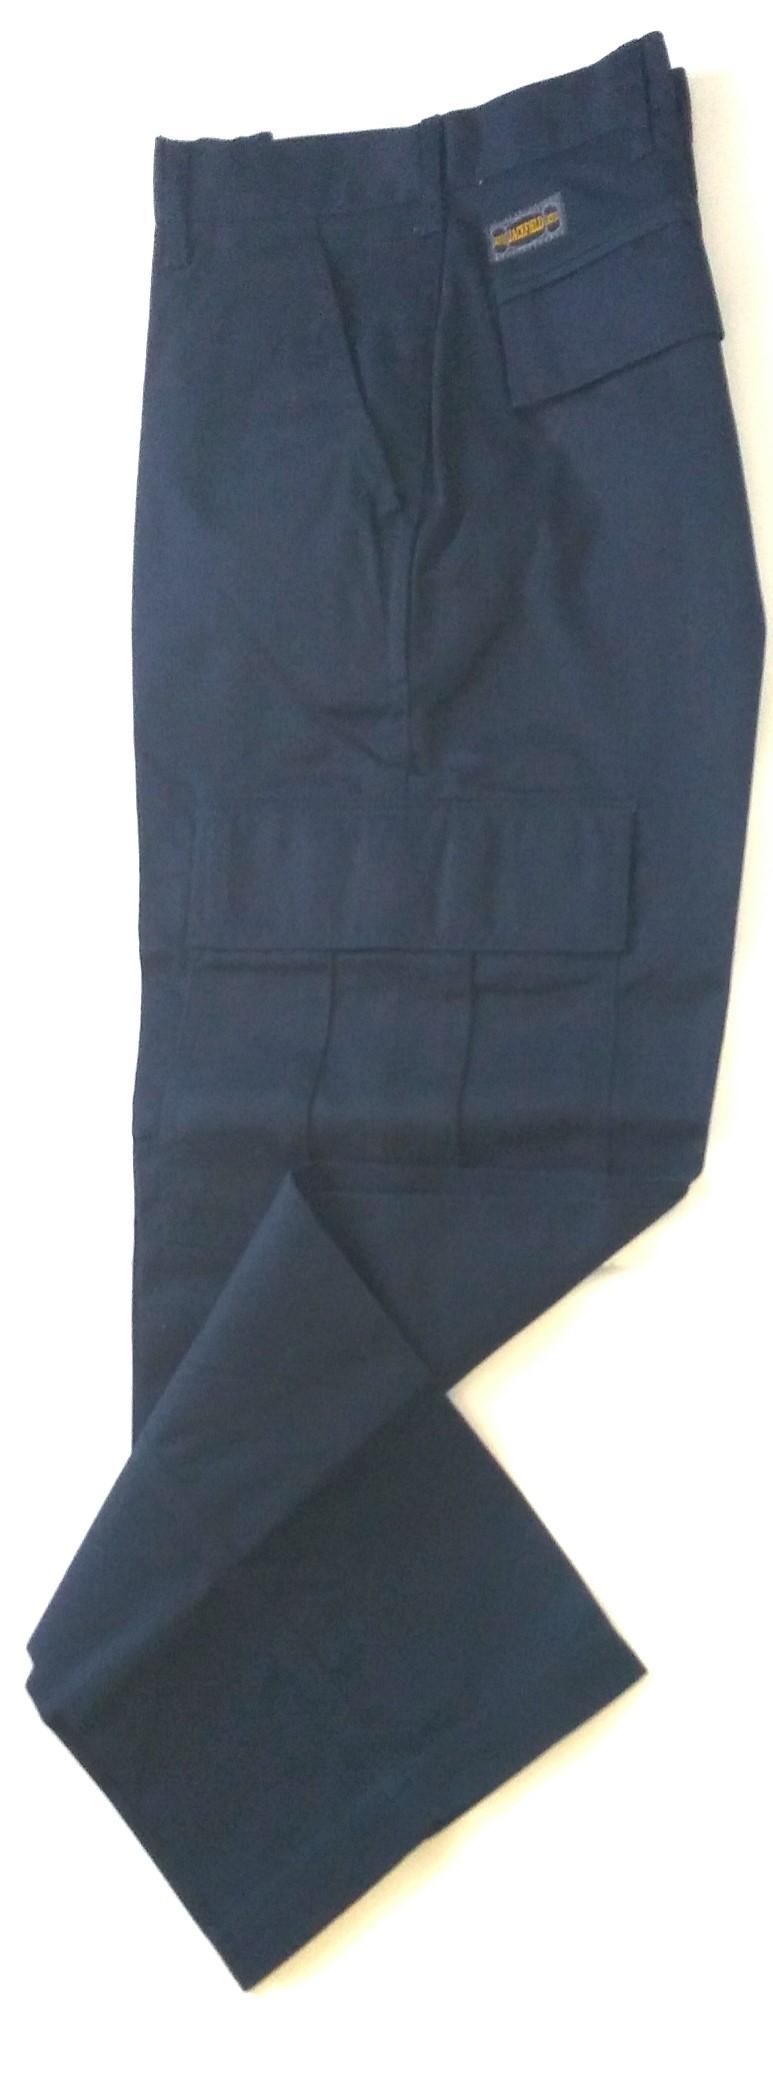 Jackfield work pant cargo pockets (70-053)